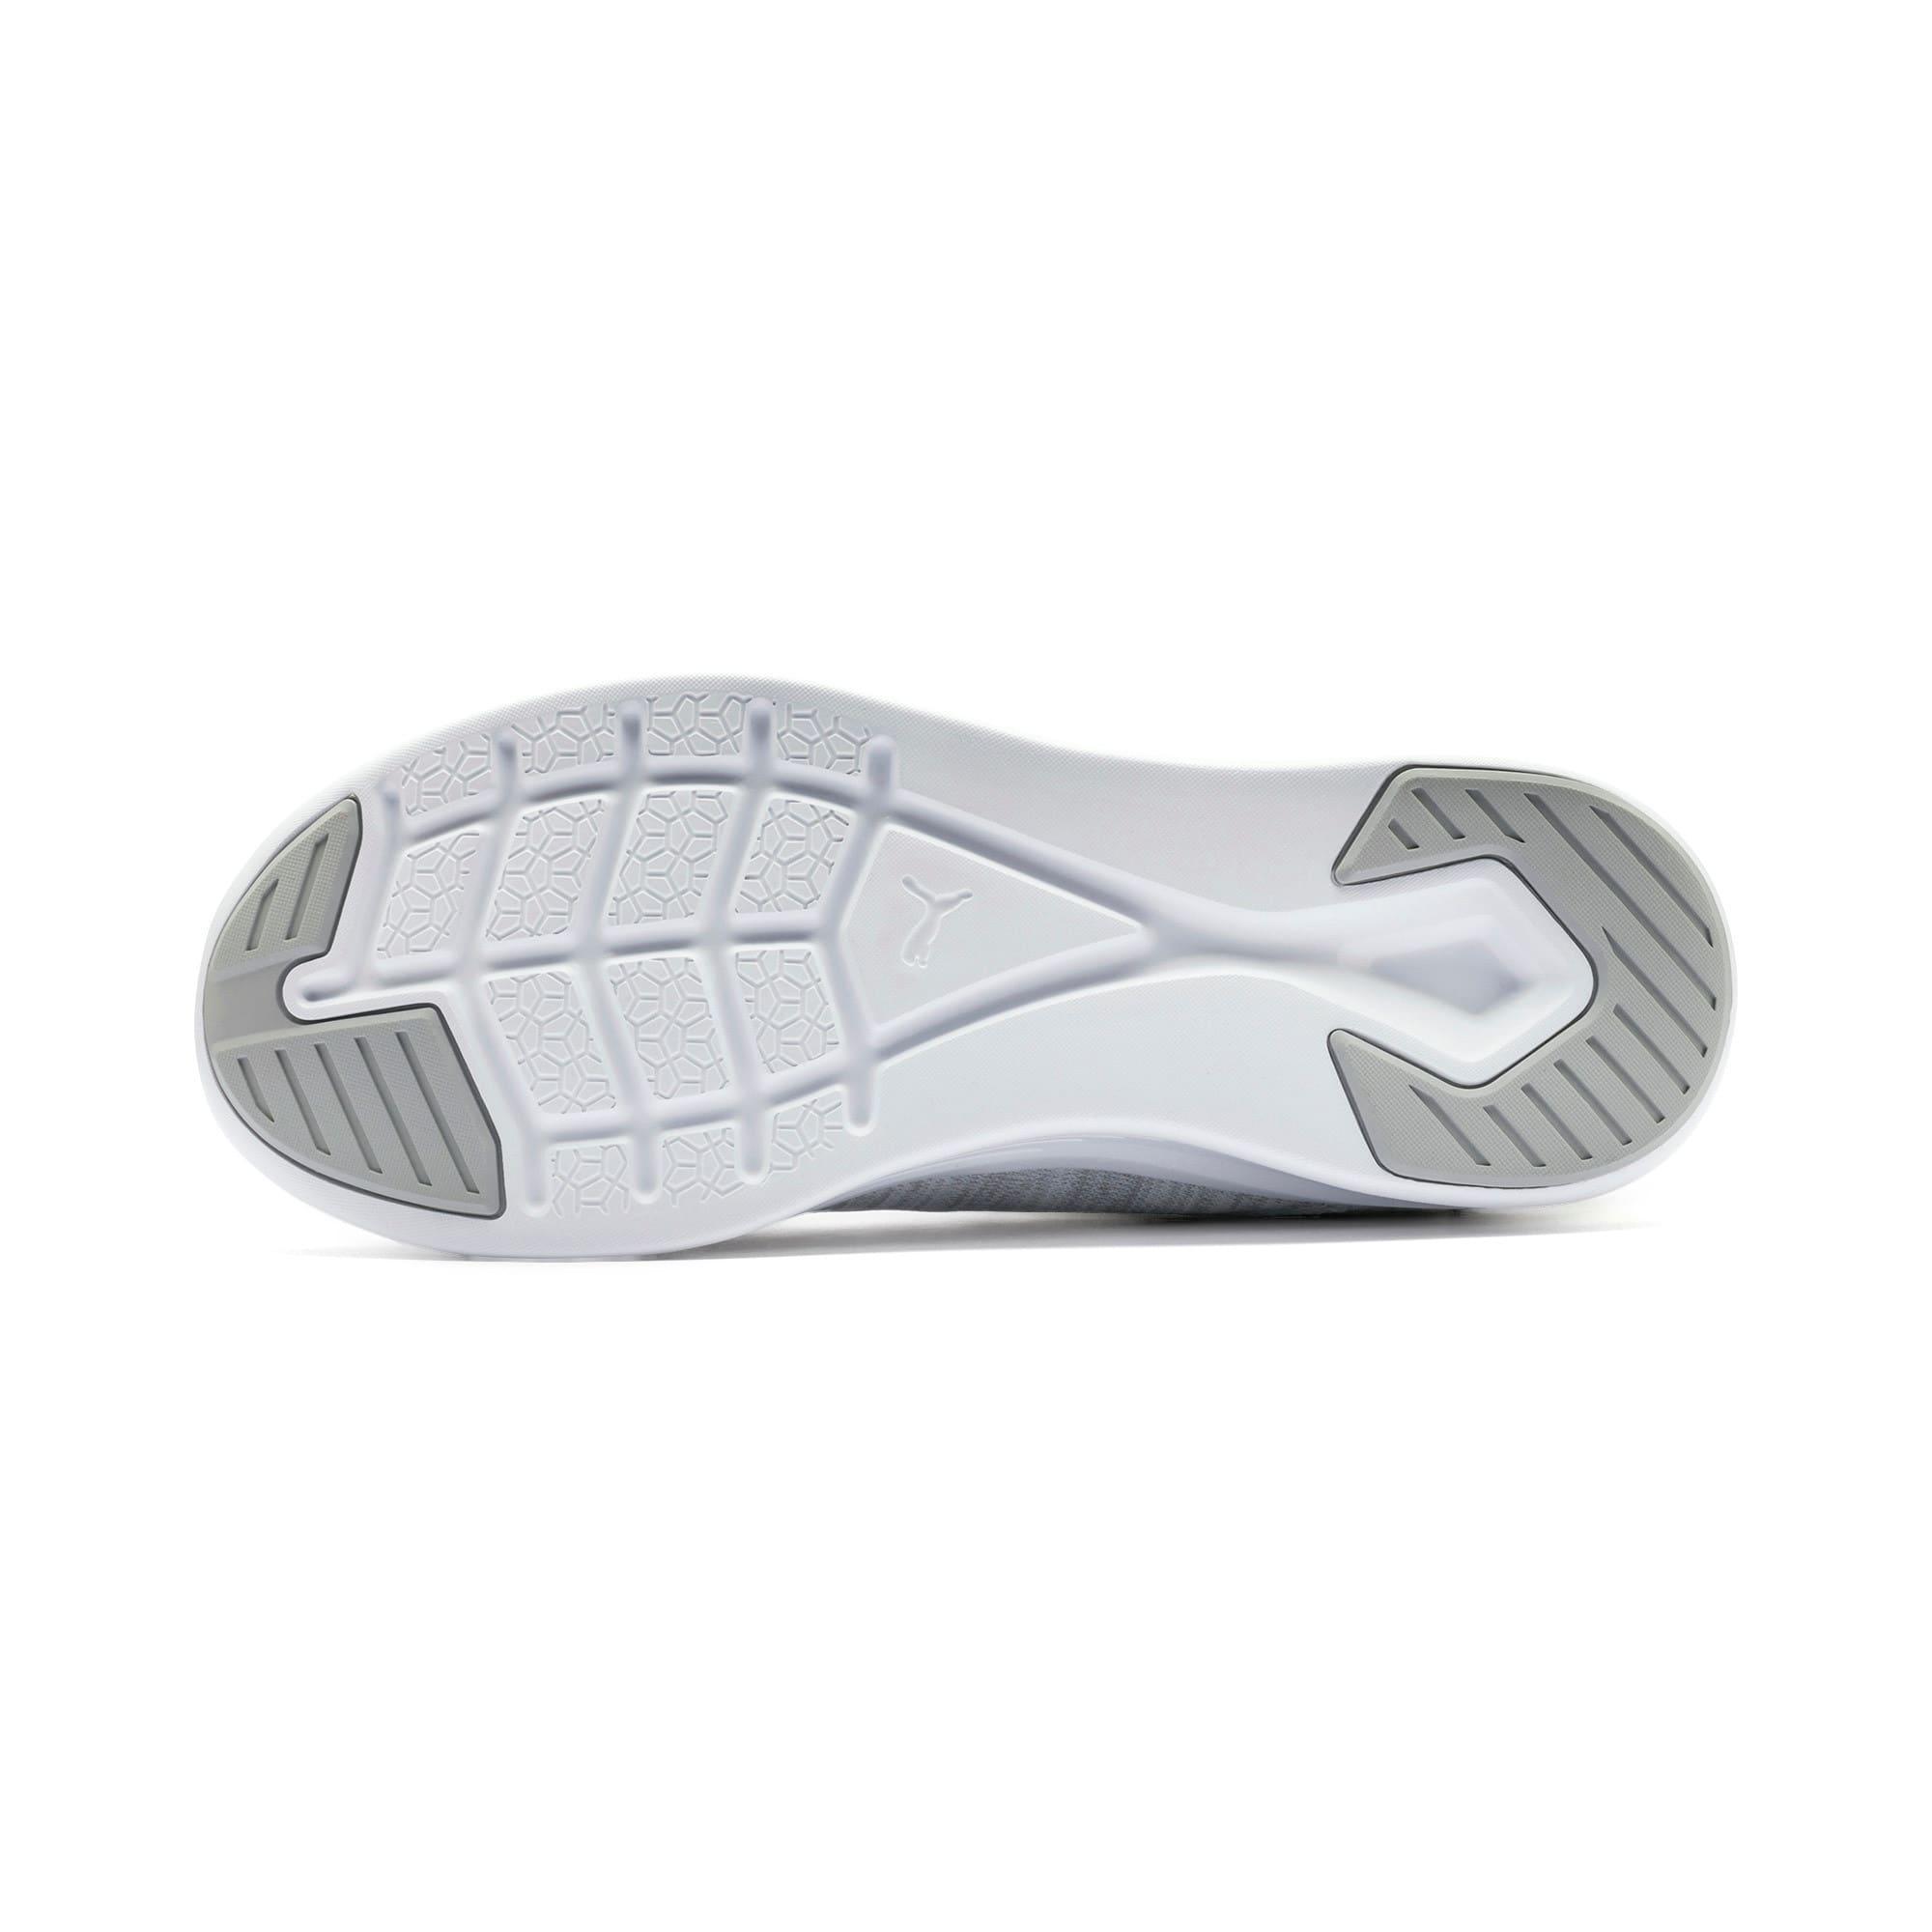 Thumbnail 6 of IGNITE Flash evoKNIT Men's Training Shoes, White-High Rise-Yellow Alert, medium-IND